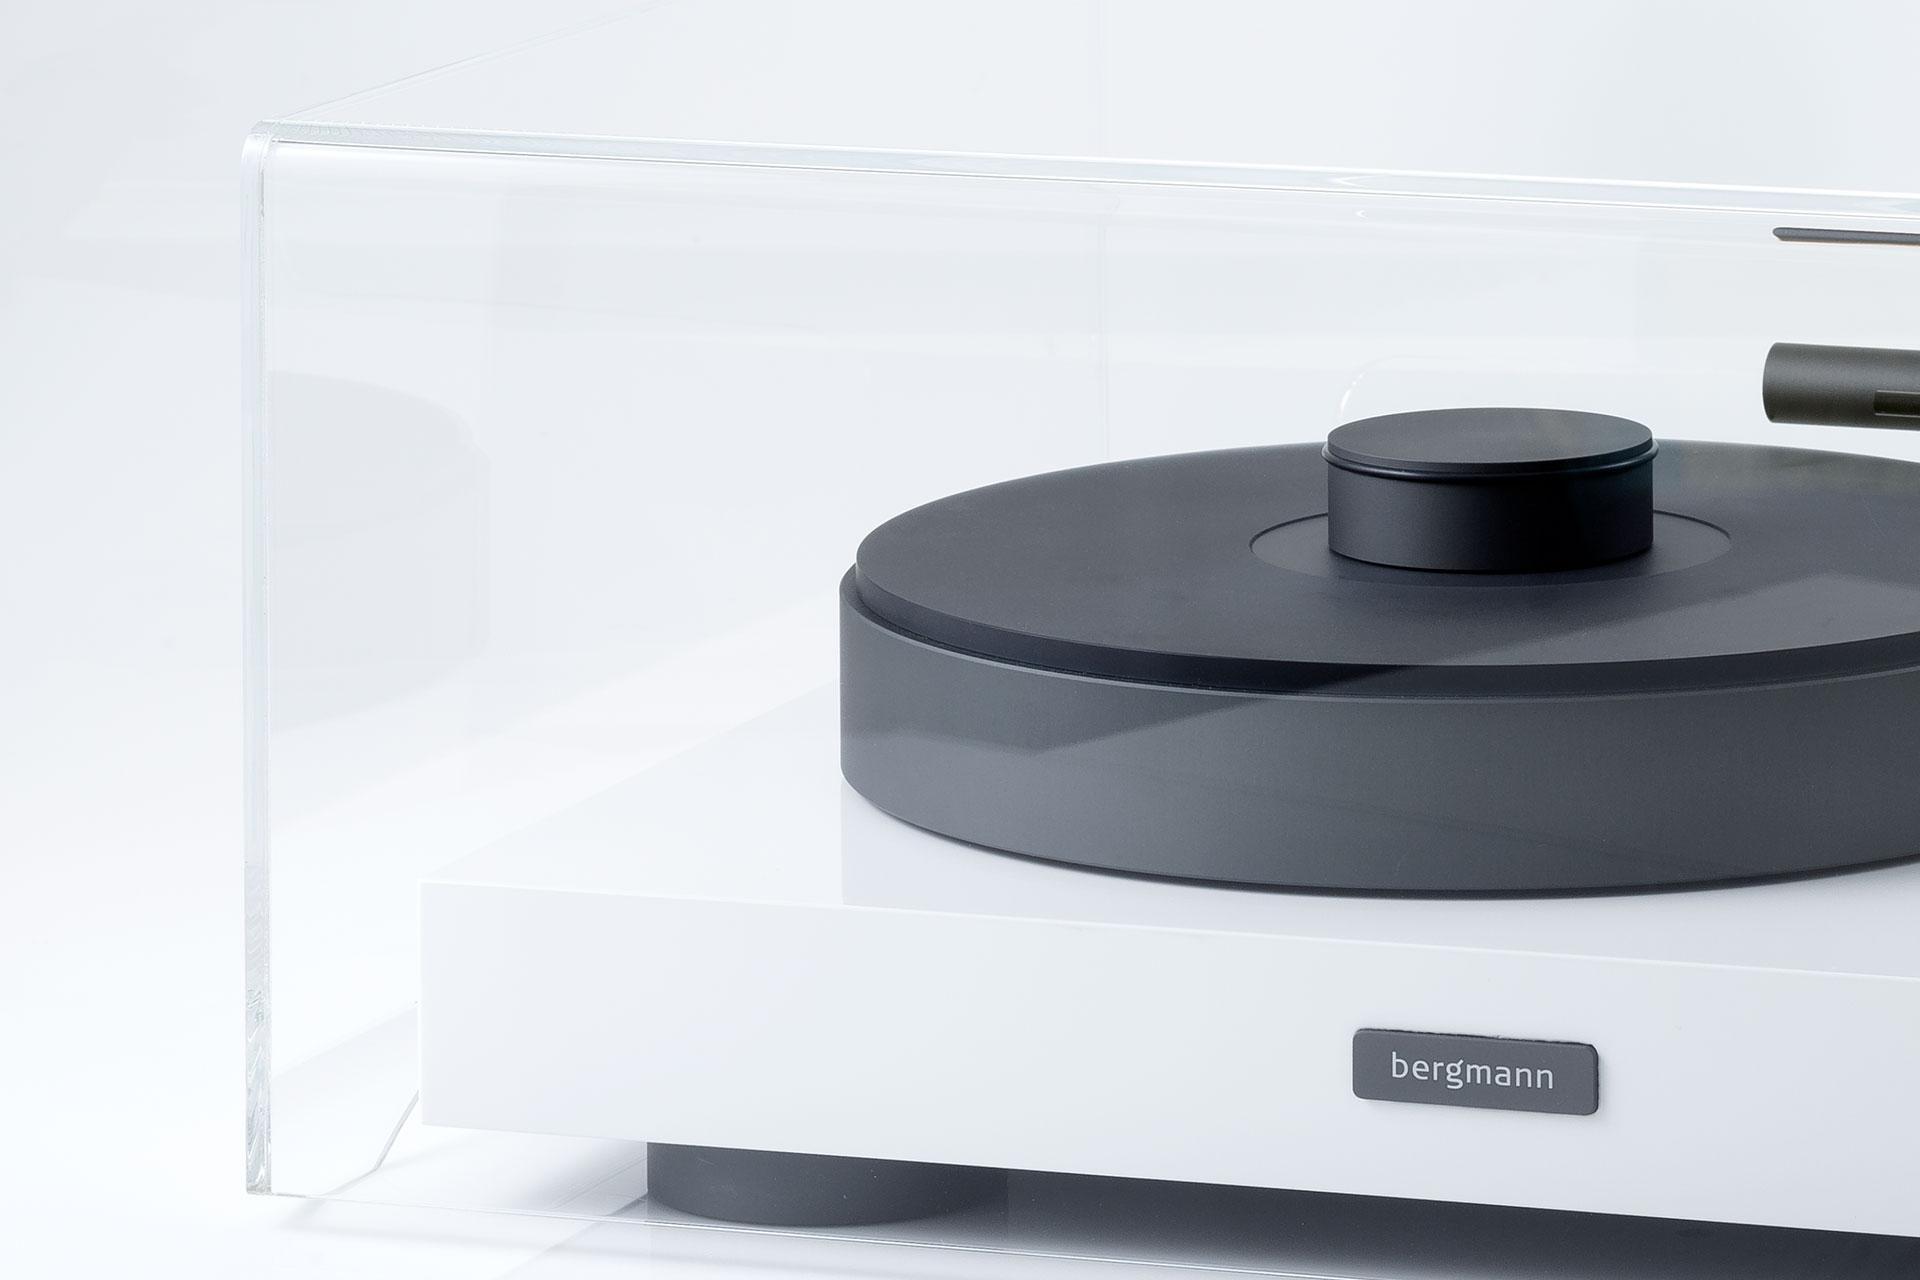 Product: Full cover for turntables. Danish Design from Bergmann Audio